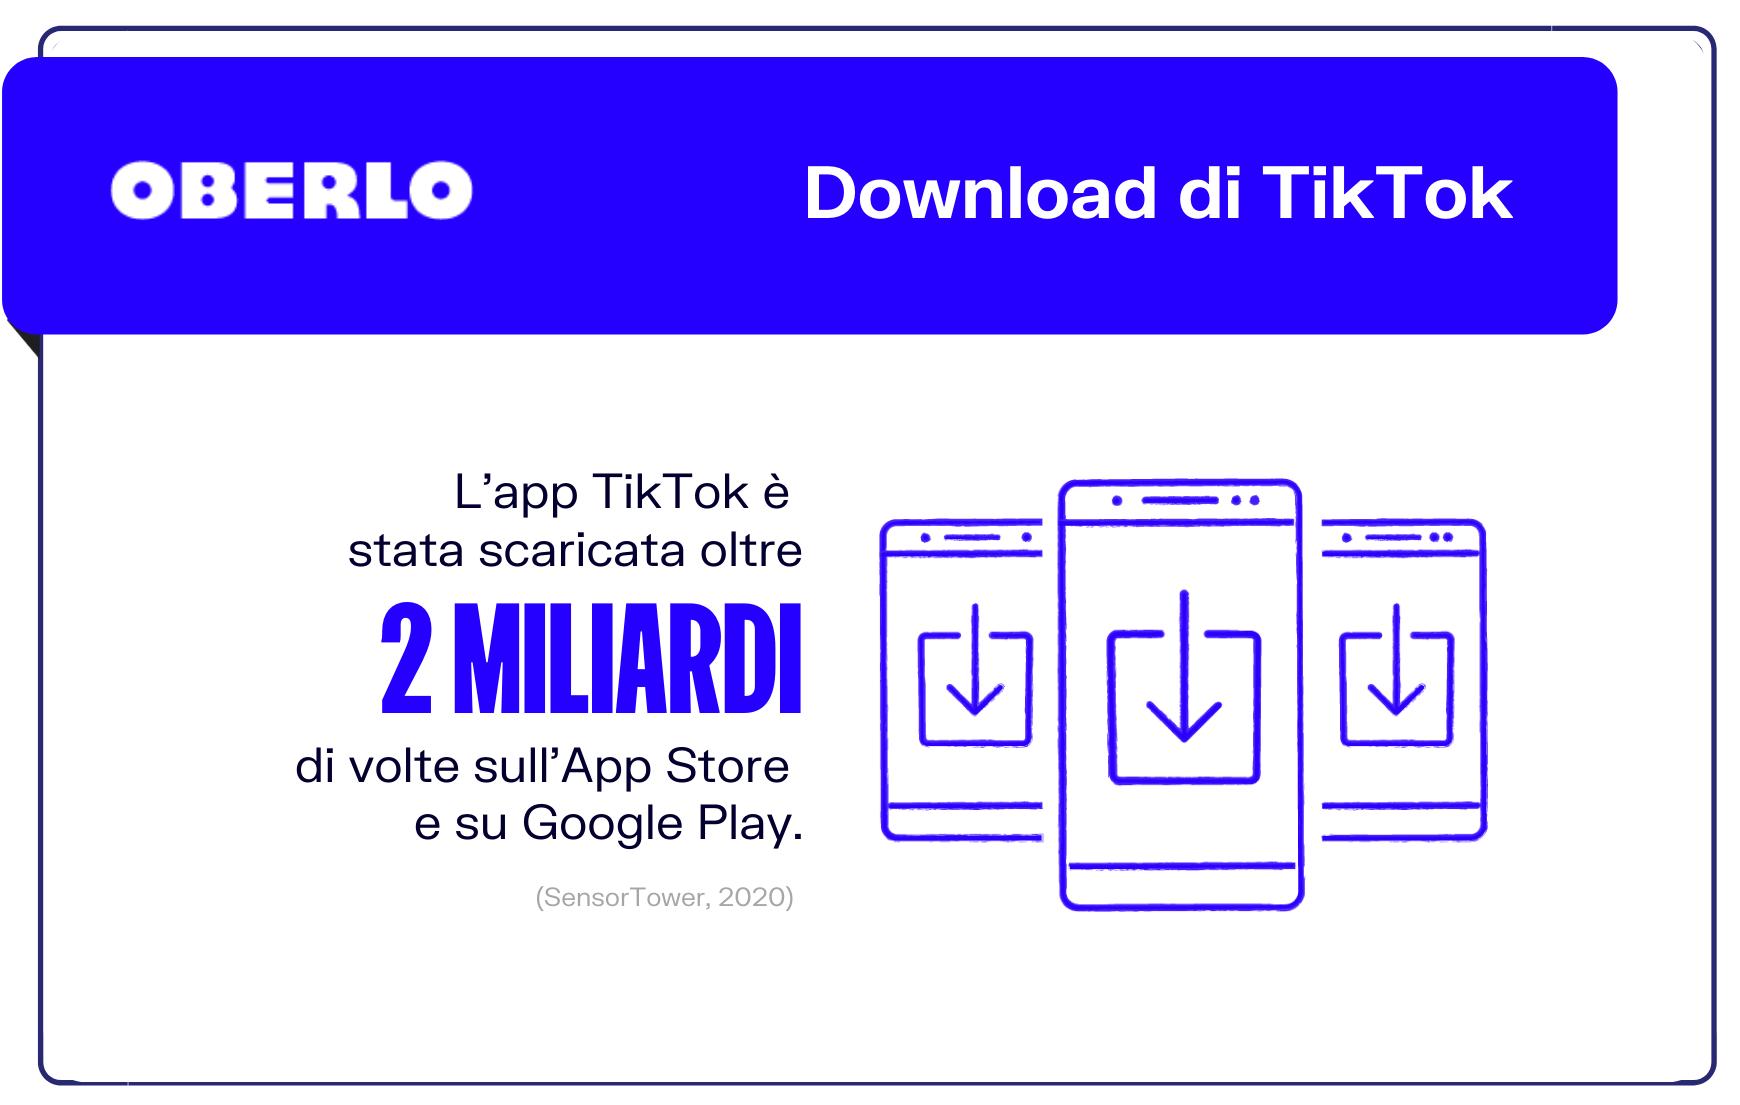 download dell'app